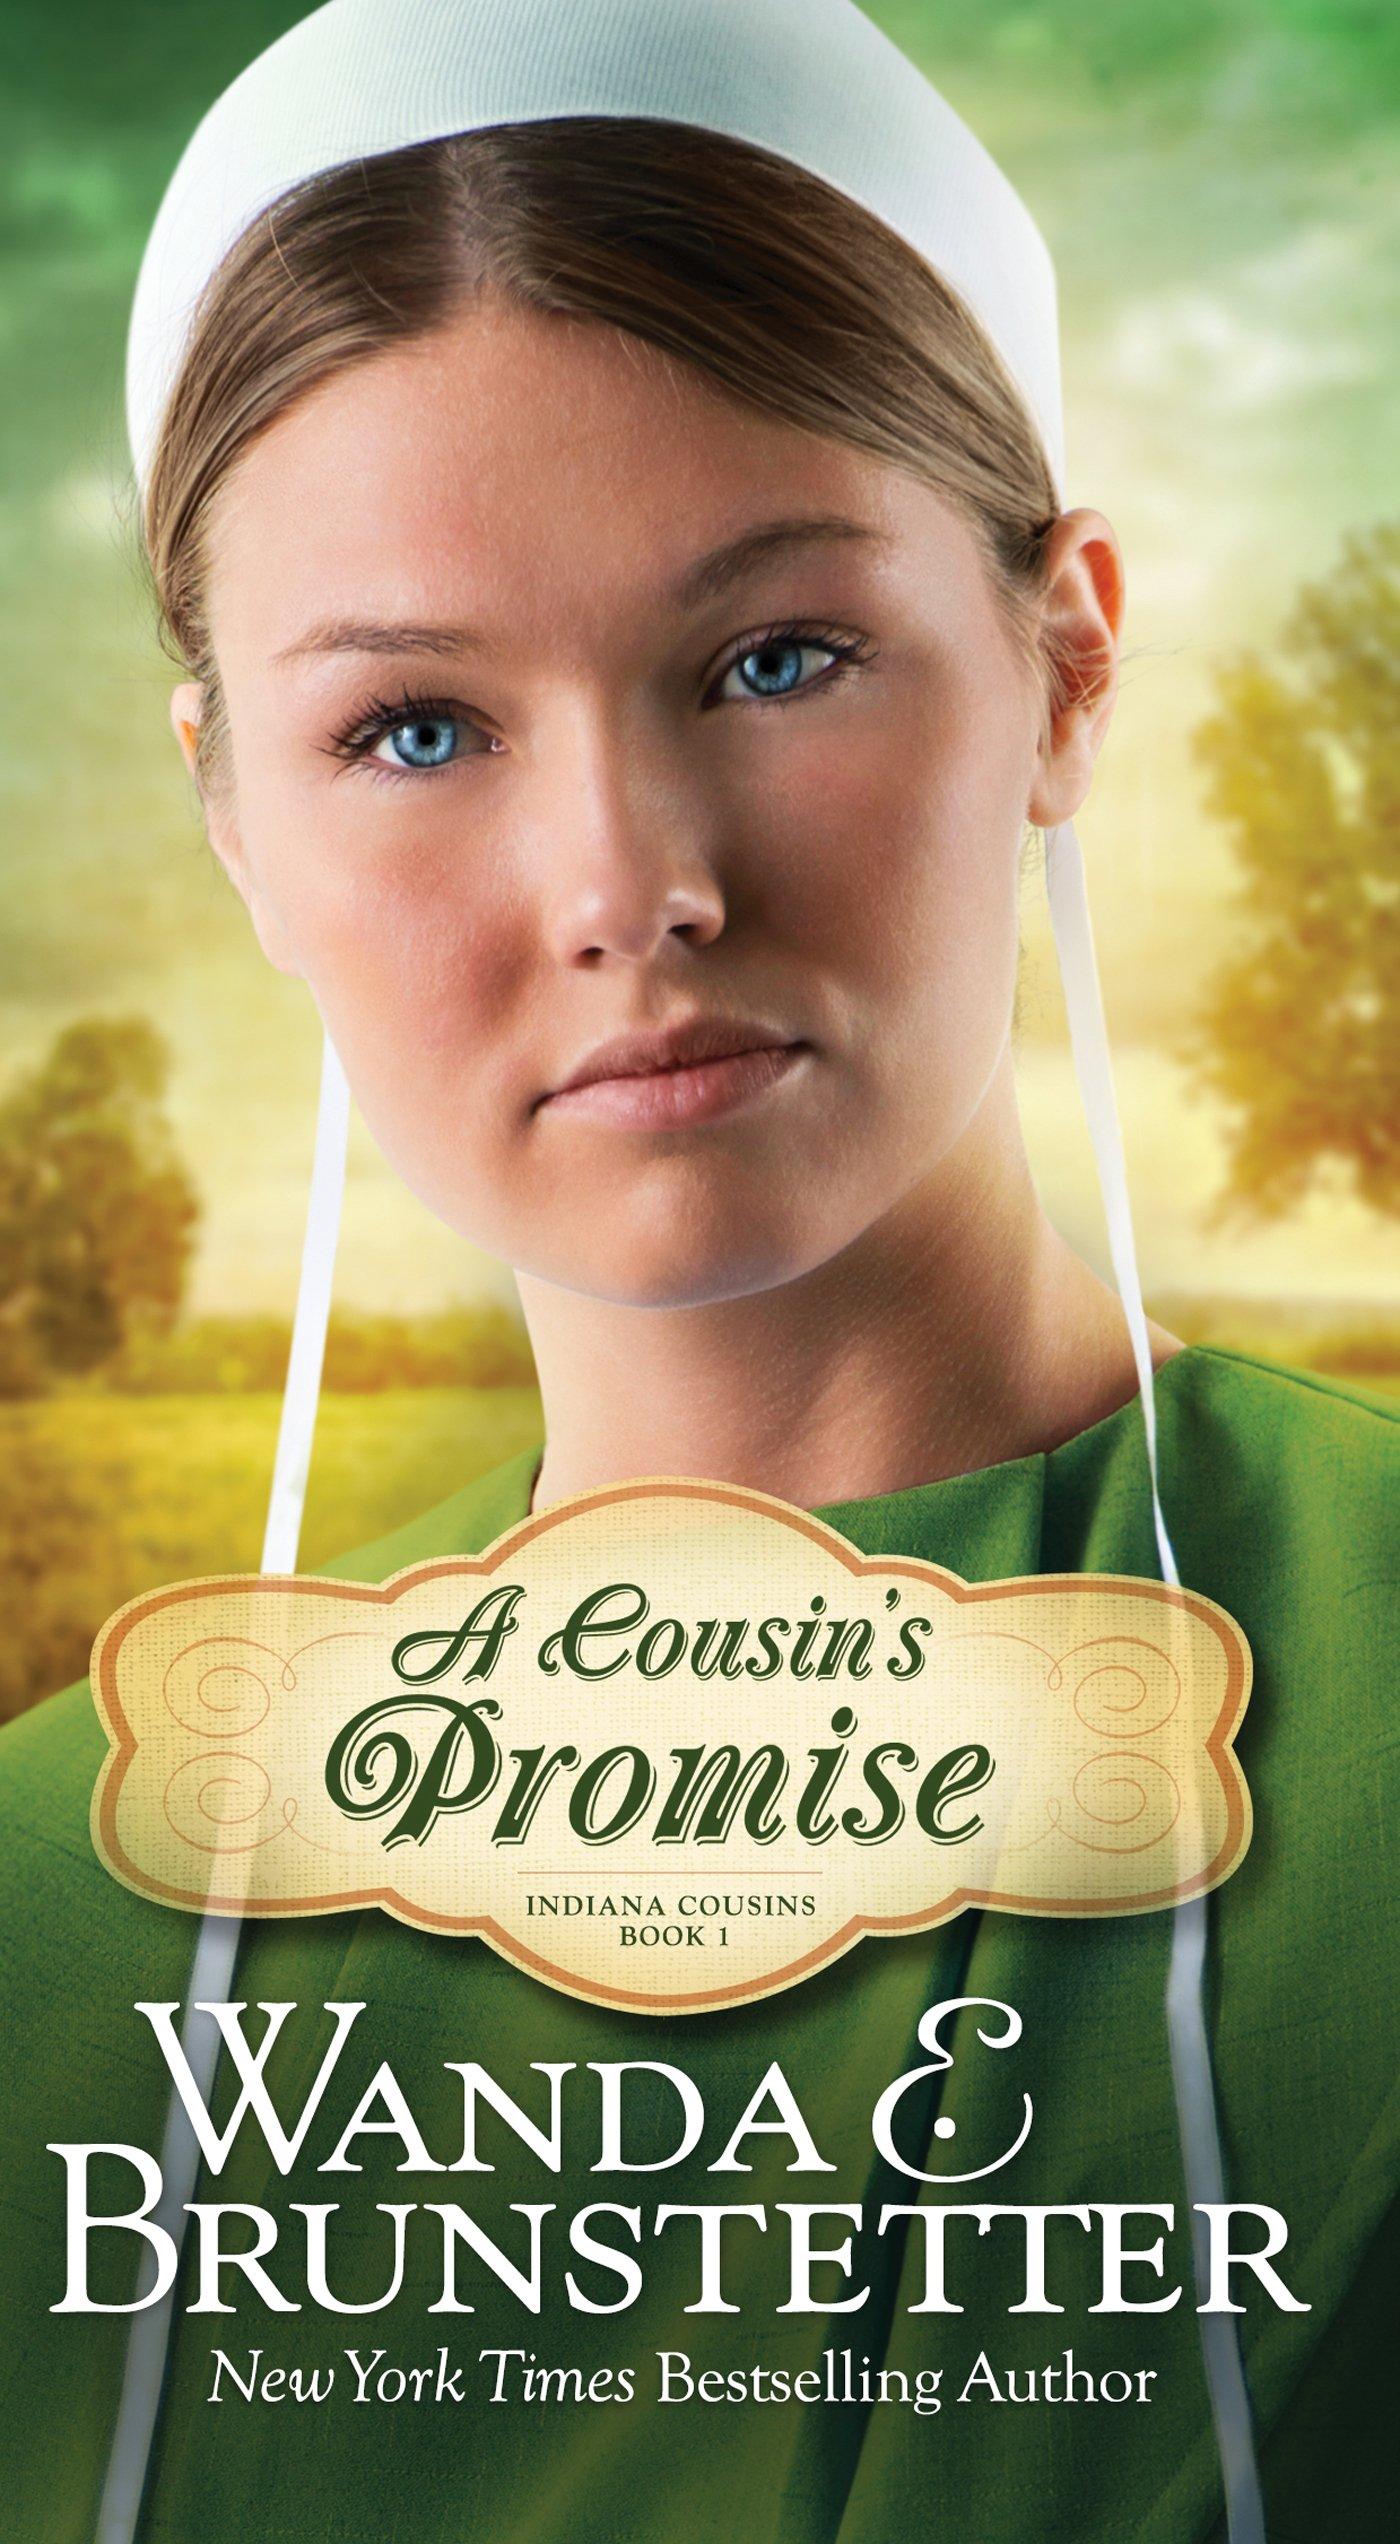 A Cousin's Promise (Indiana Cousins): Wanda E. Brunstetter: 9781683220701:  Amazon.com: Books